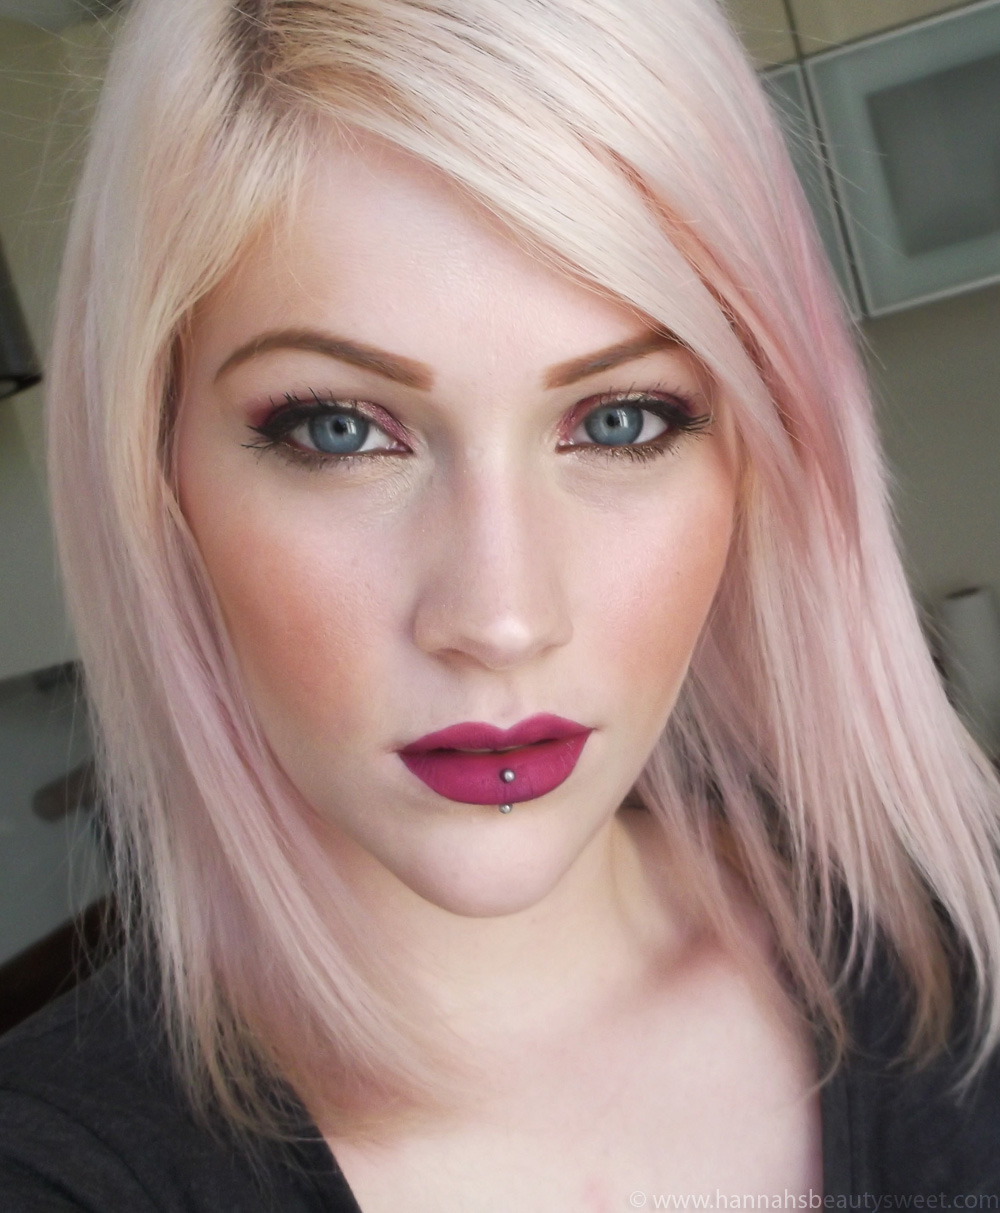 Lips, matte lipstick, matte lips, Topshop, Velvet lips, The Damned, swatch, purple lips, girl, blonde, purple lipstick